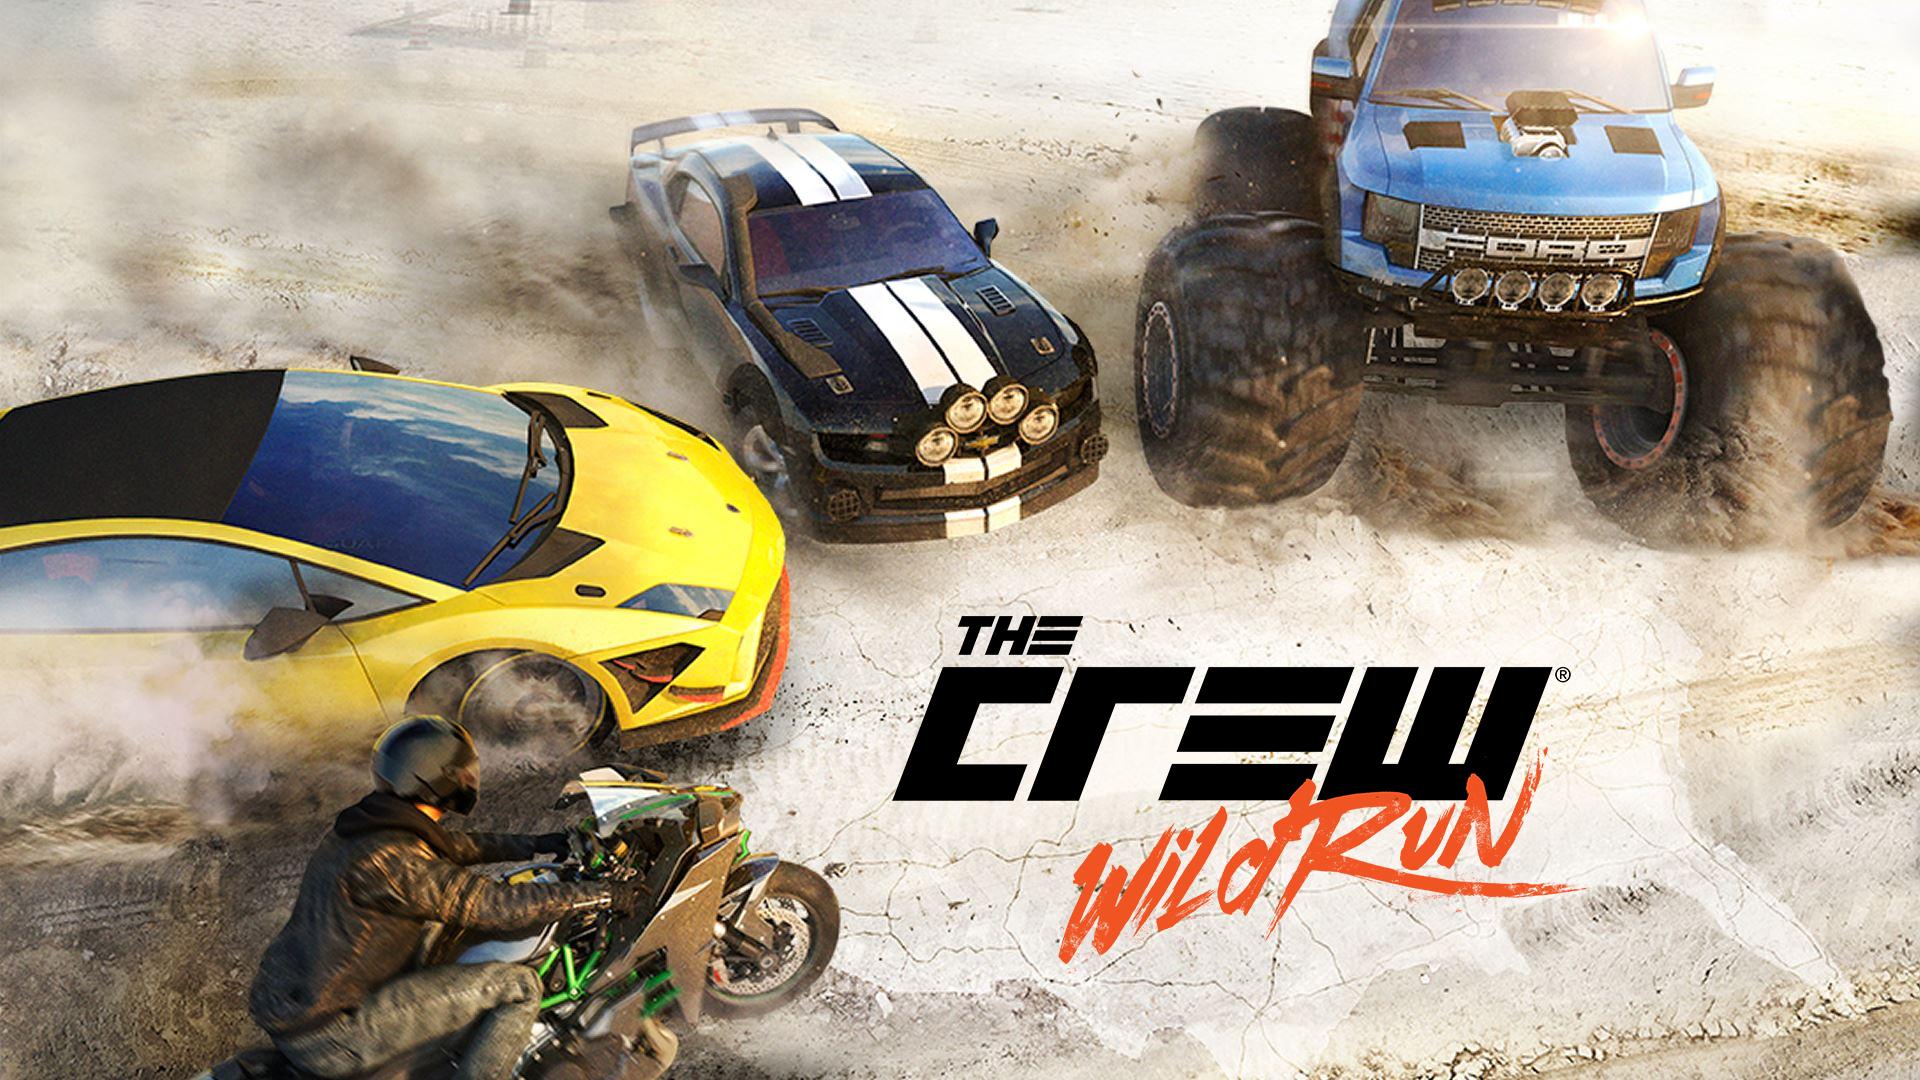 The Crew Wild Run artwork